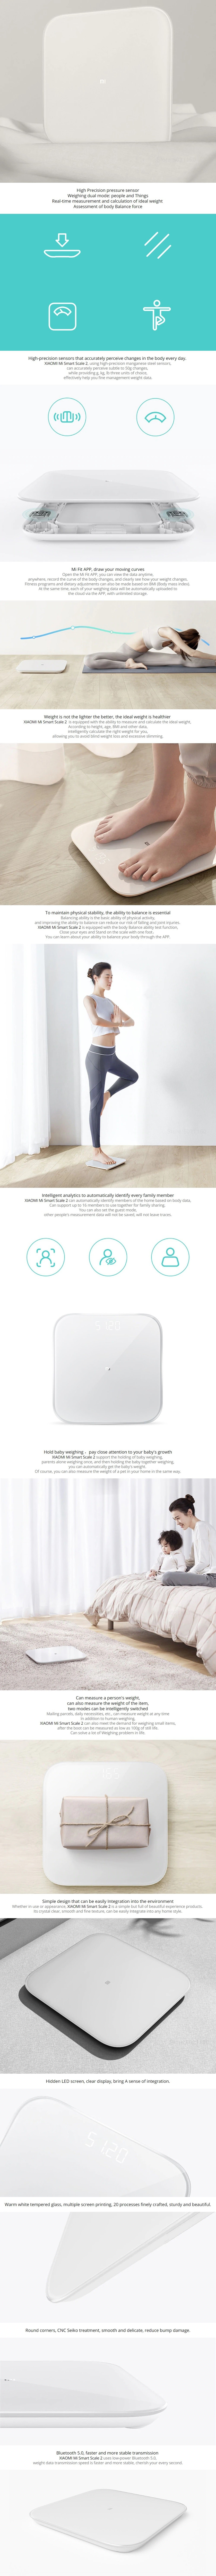 Prezentare-Xiaomi-Mi-Smart-Scale-27513d56ad4bb712b.jpg